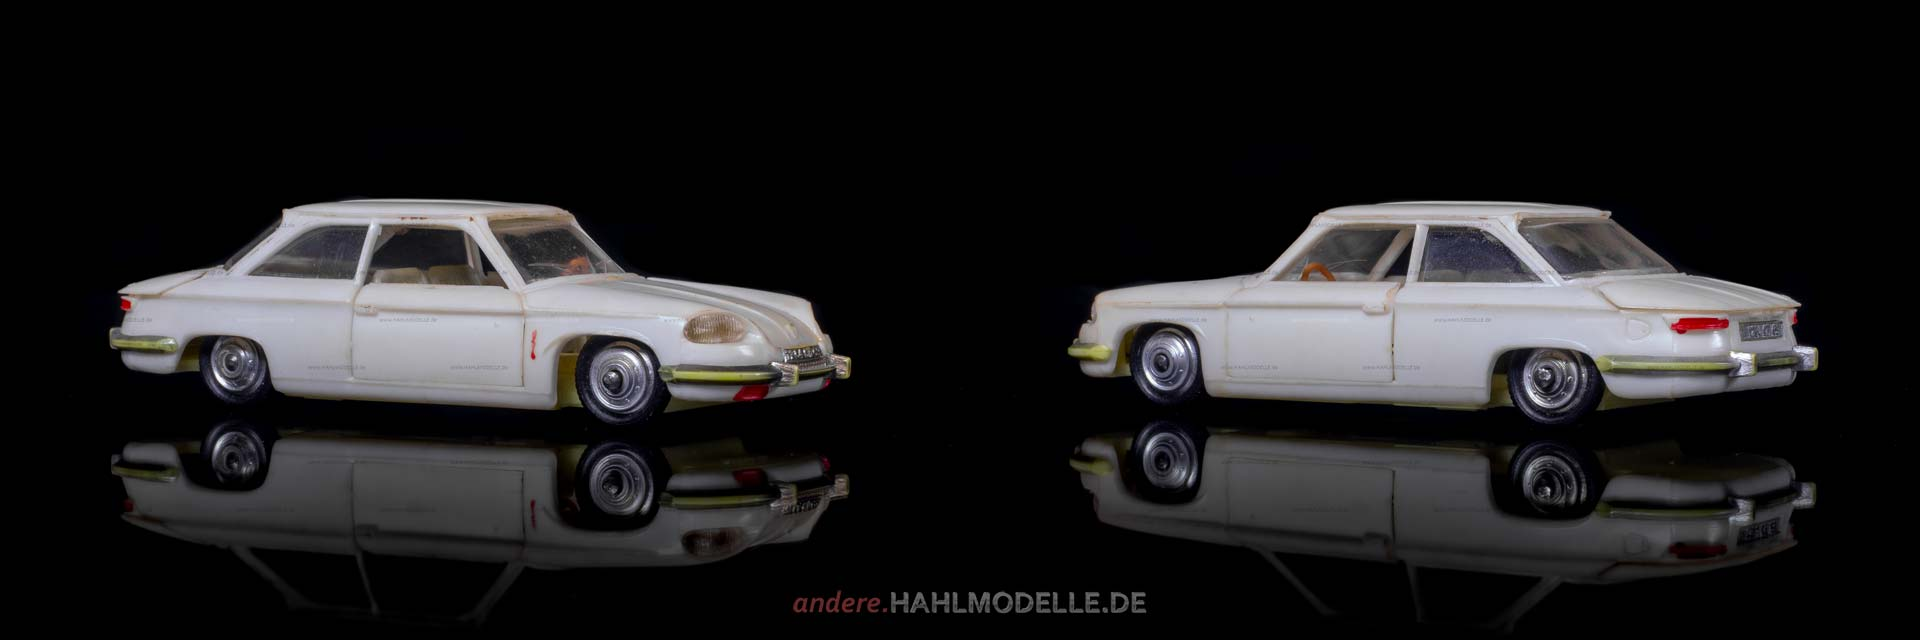 Panhard 24 BT | Limousine | Siharuli | 1:43 | www.andere.hahlmodelle.de